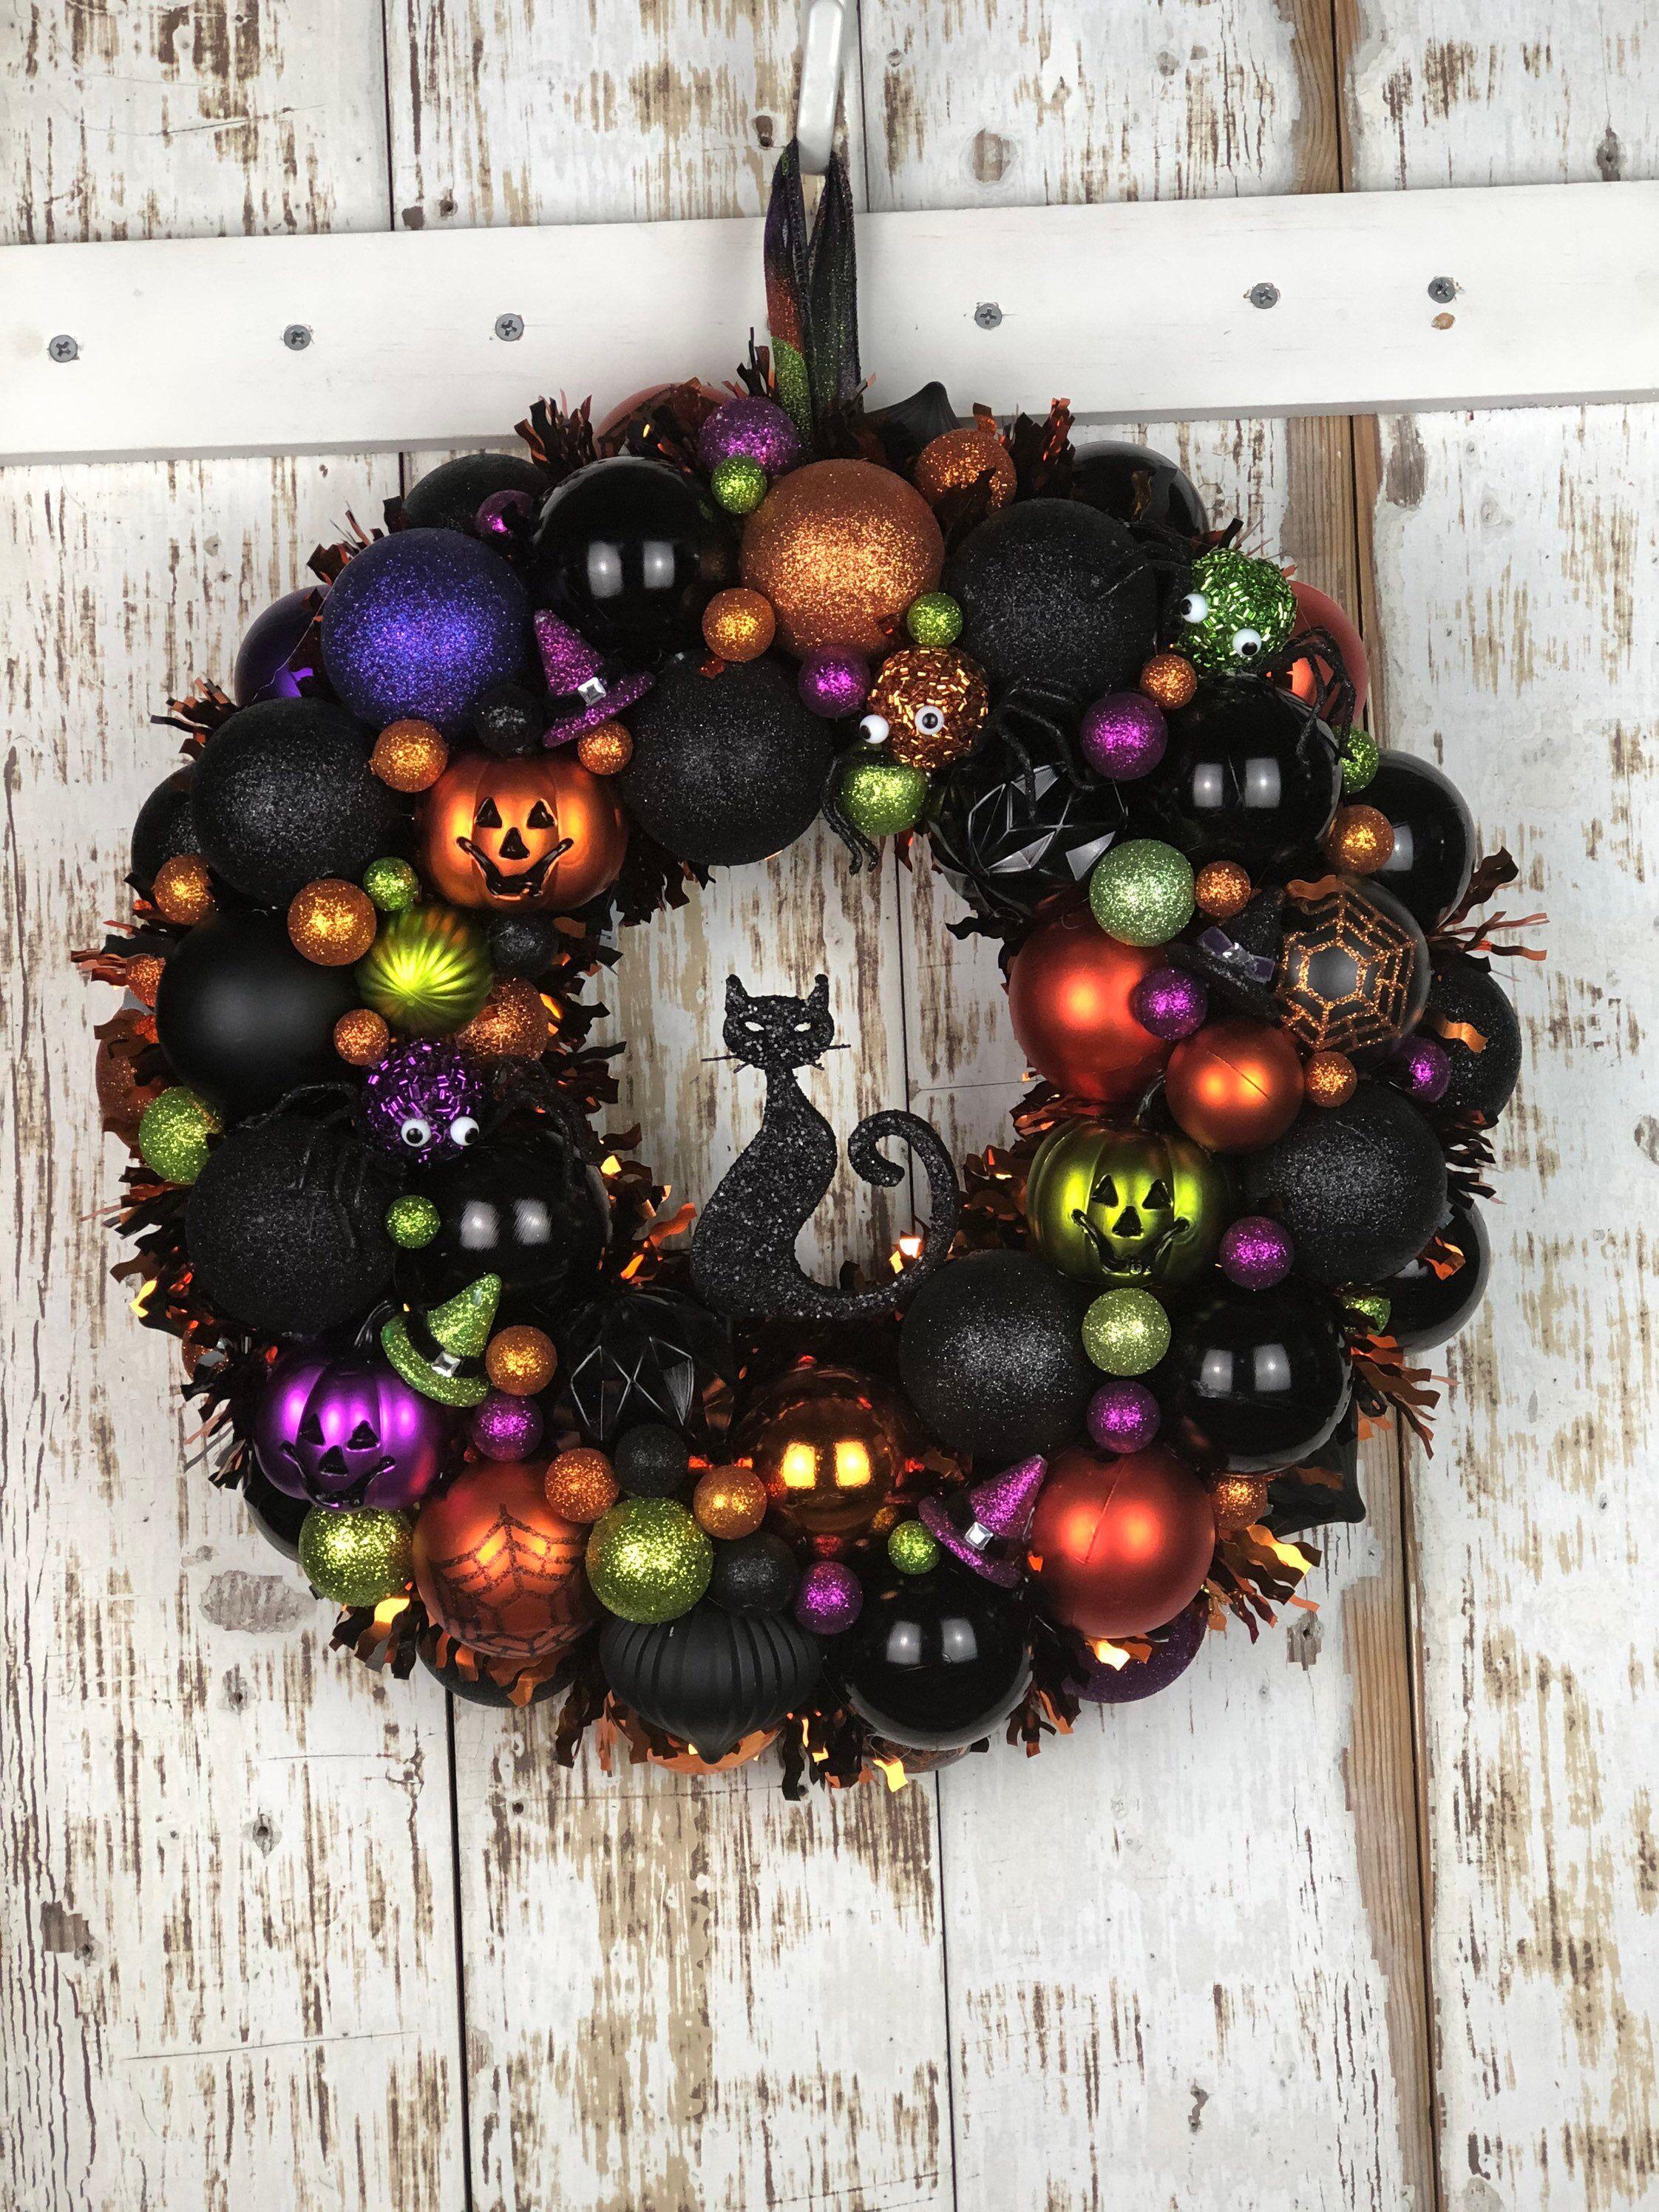 Black Cat Ornament Wreath For Halloween Halloween Decor For Etsy In 2020 Diy Halloween Wreath Halloween Ornament Wreath Halloween Wreath